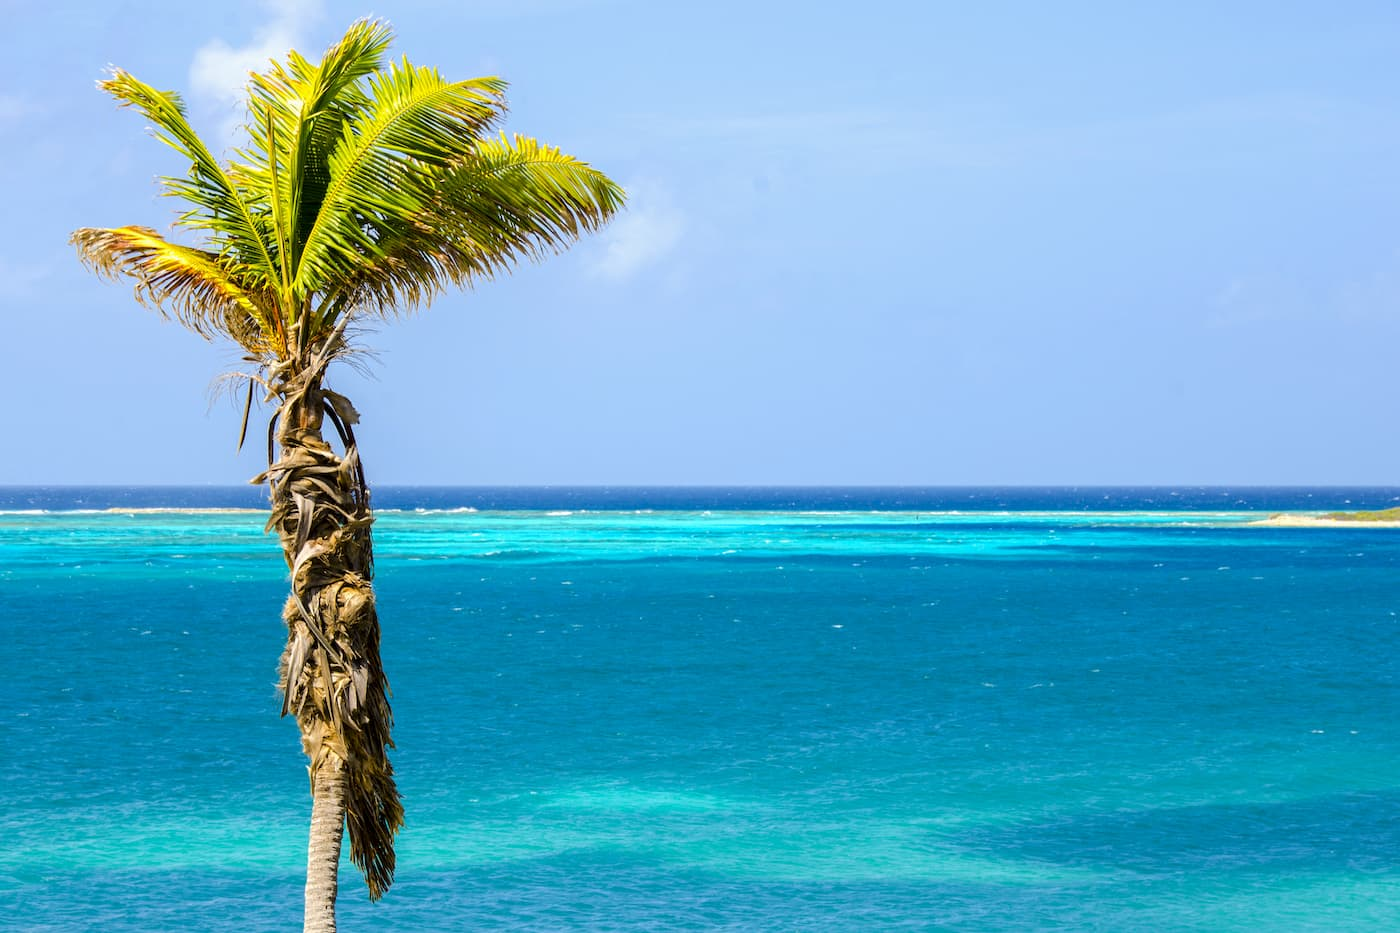 Sweeping views at Rodgers Beach, Aruba.